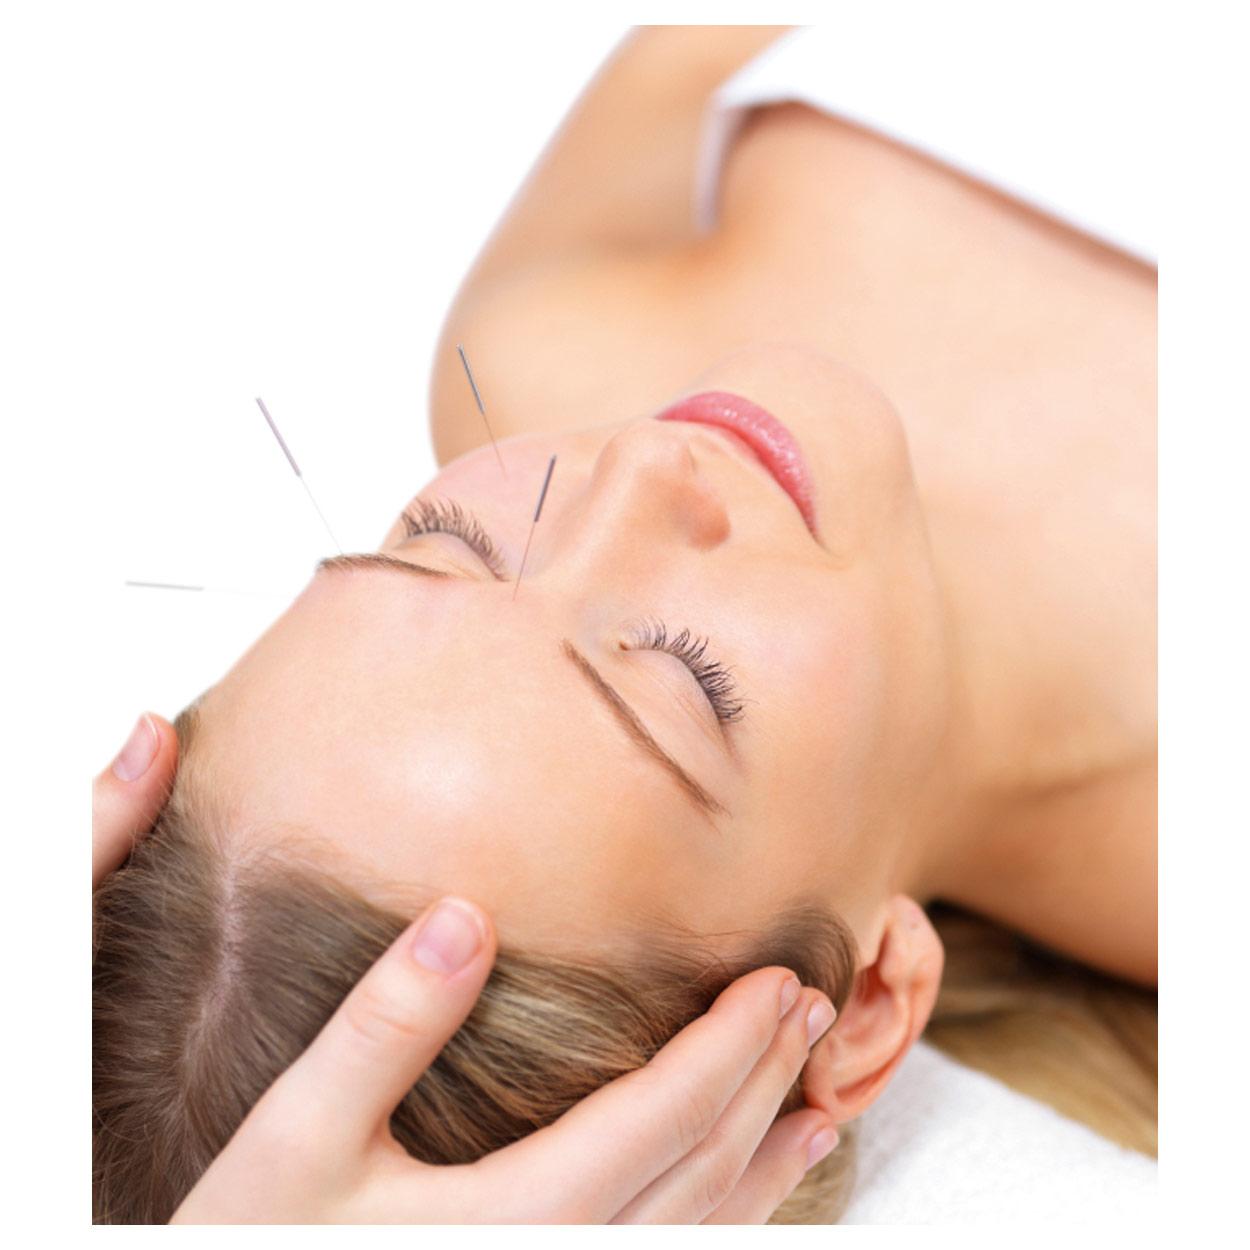 Indexbild 10 - Akupunkturnadeln mit Silbergriff, Akupunktur